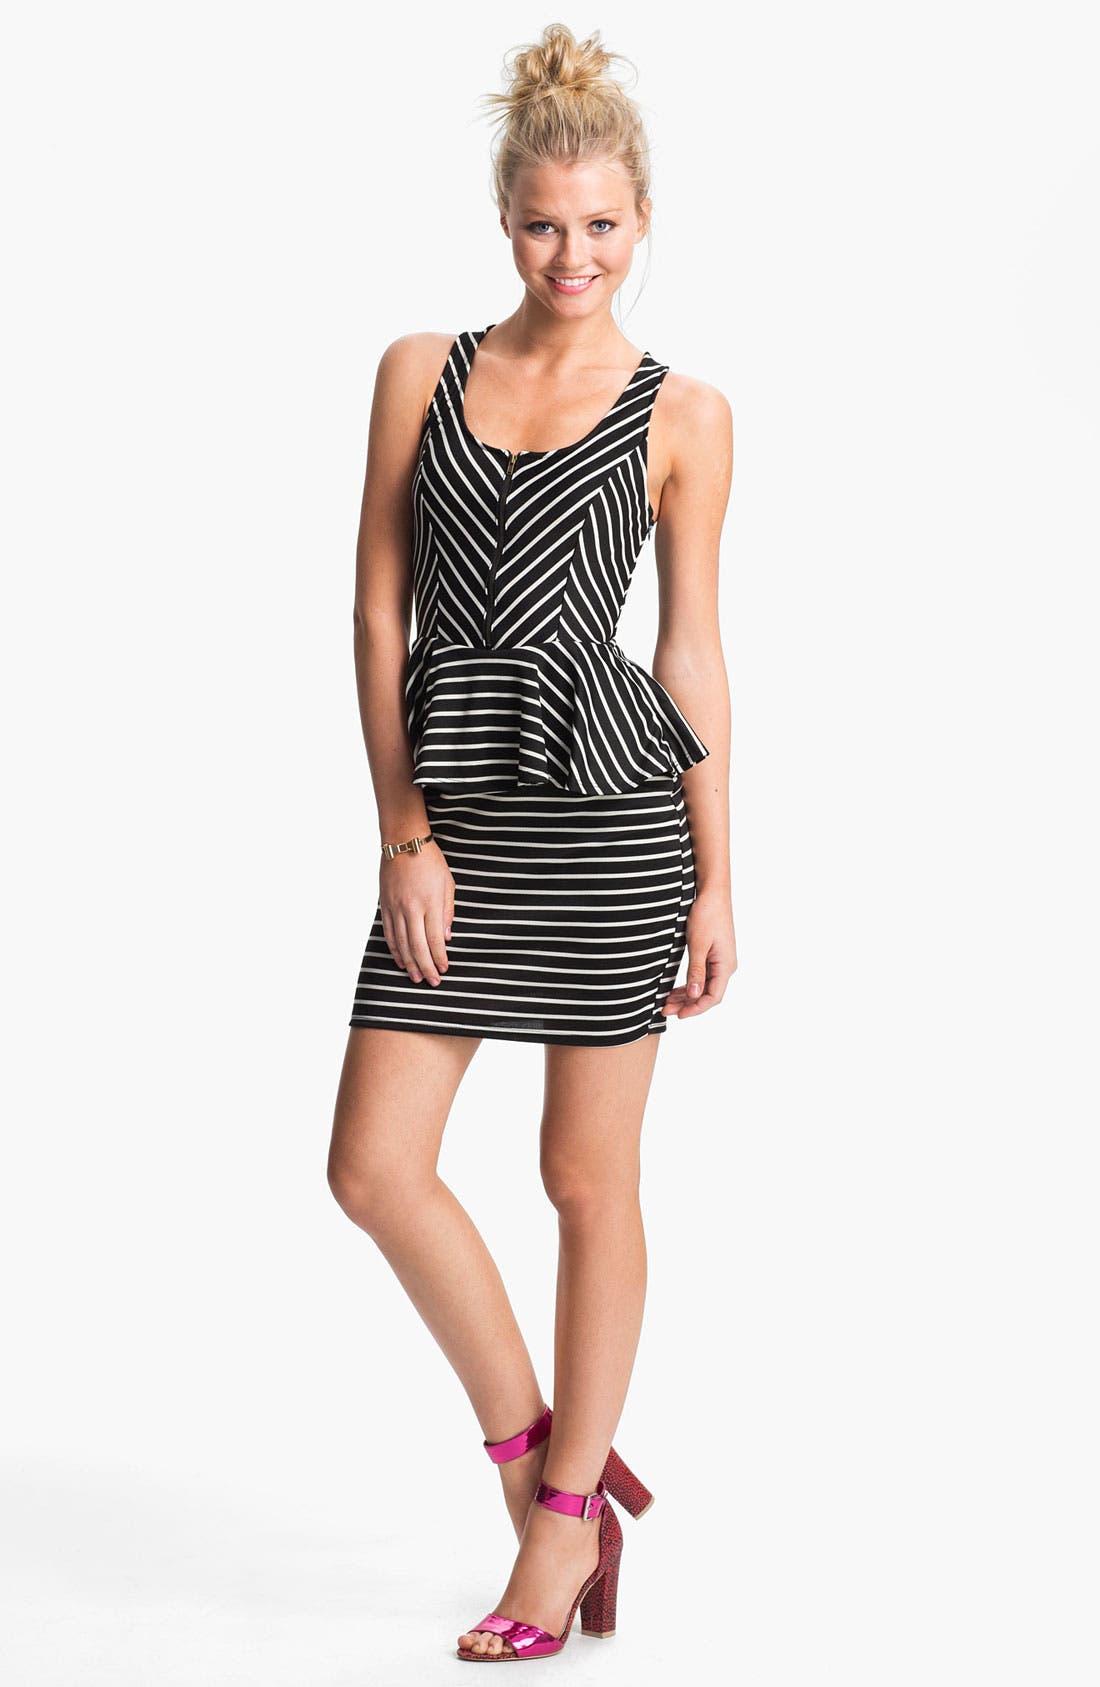 Alternate Image 1 Selected - Lush Cutout Striped Peplum Dress (Juniors)